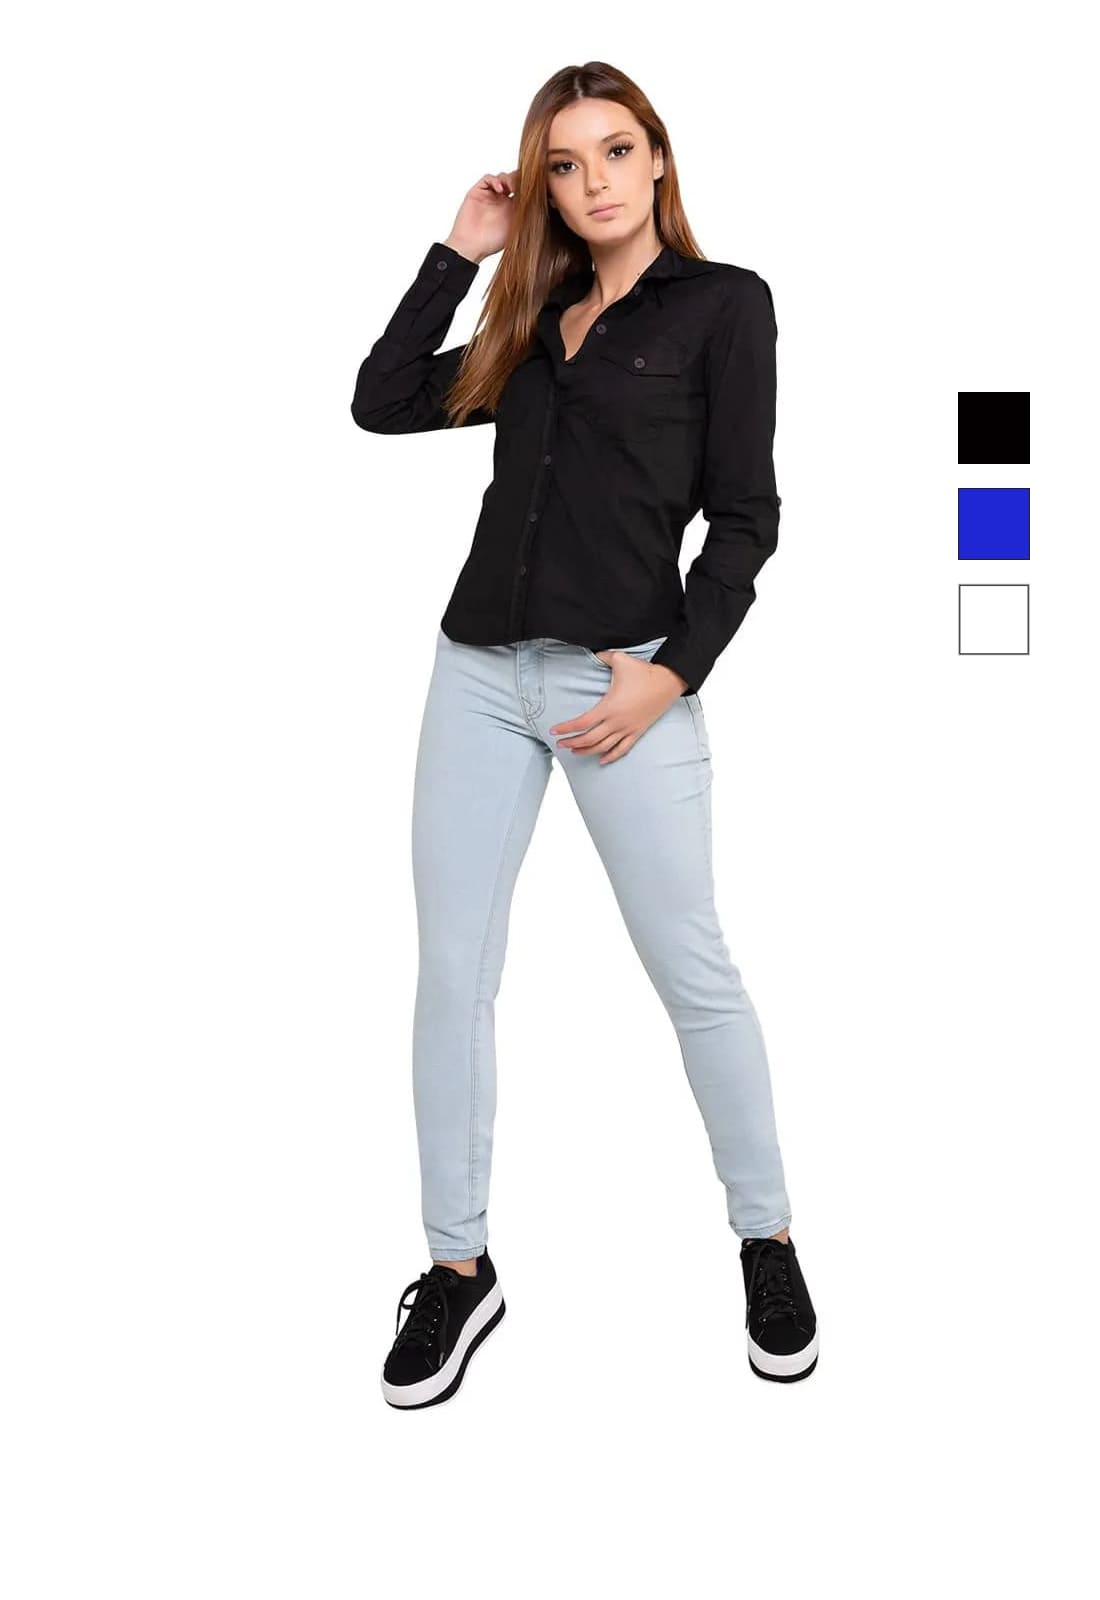 Camisa Feminina Tricoline com Elastano Manga Longa